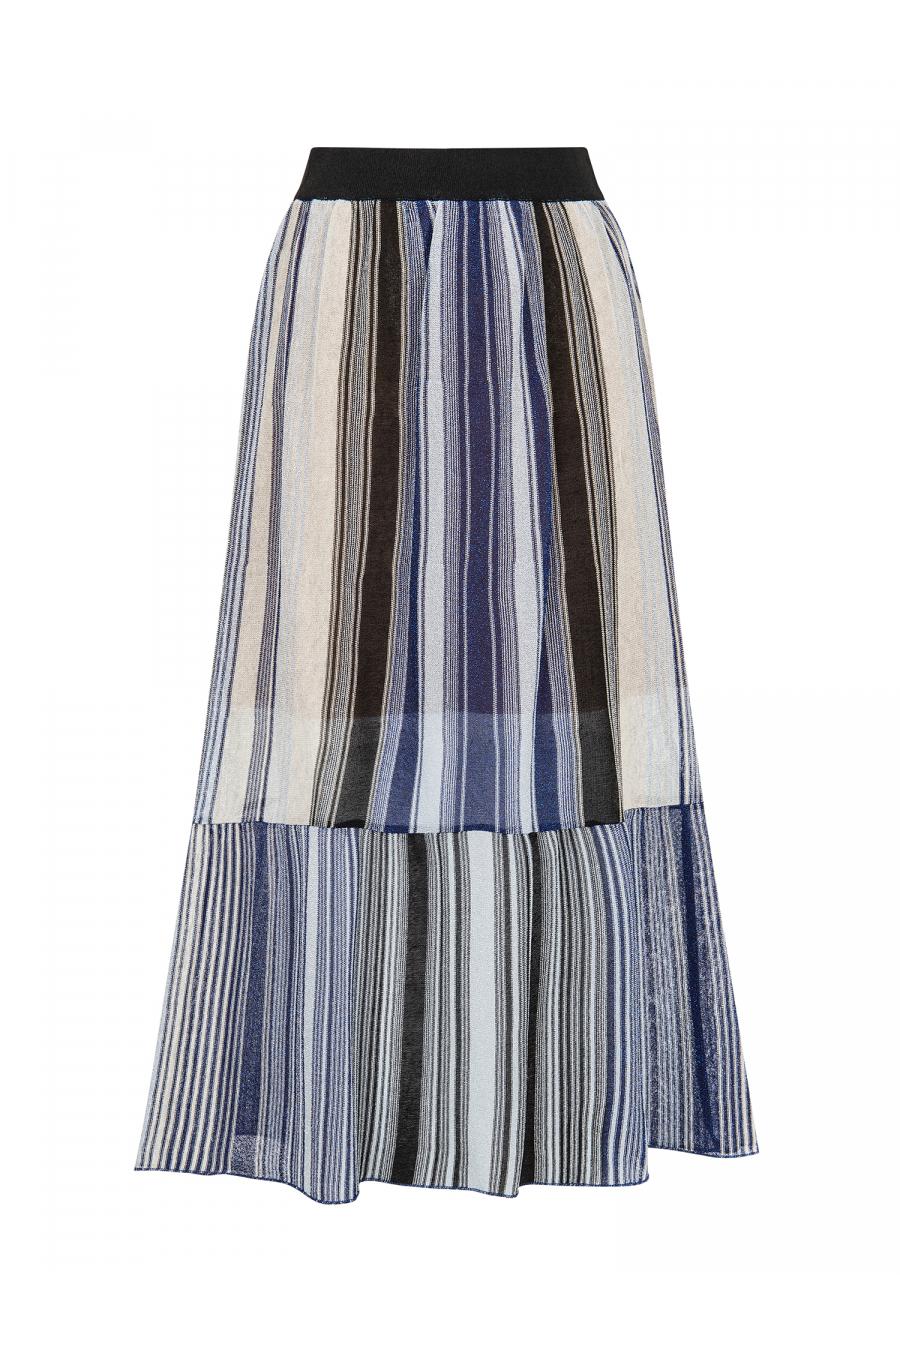 Silvery Maxi Skirt Blue